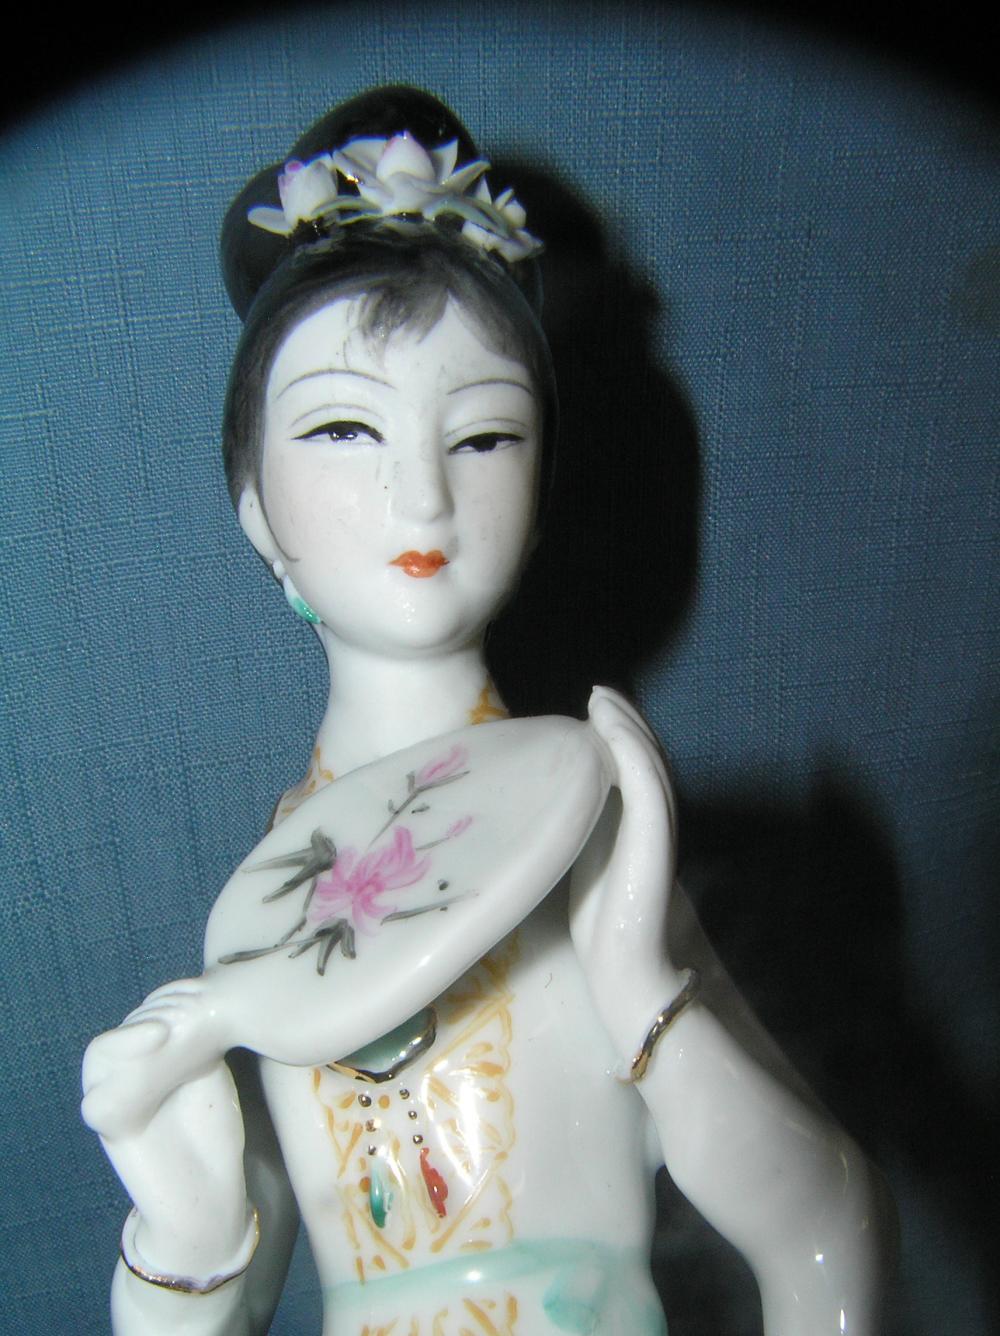 Lot 101: PORCELAIN HAND PAINTED GEISHA GIRL FIGURINE